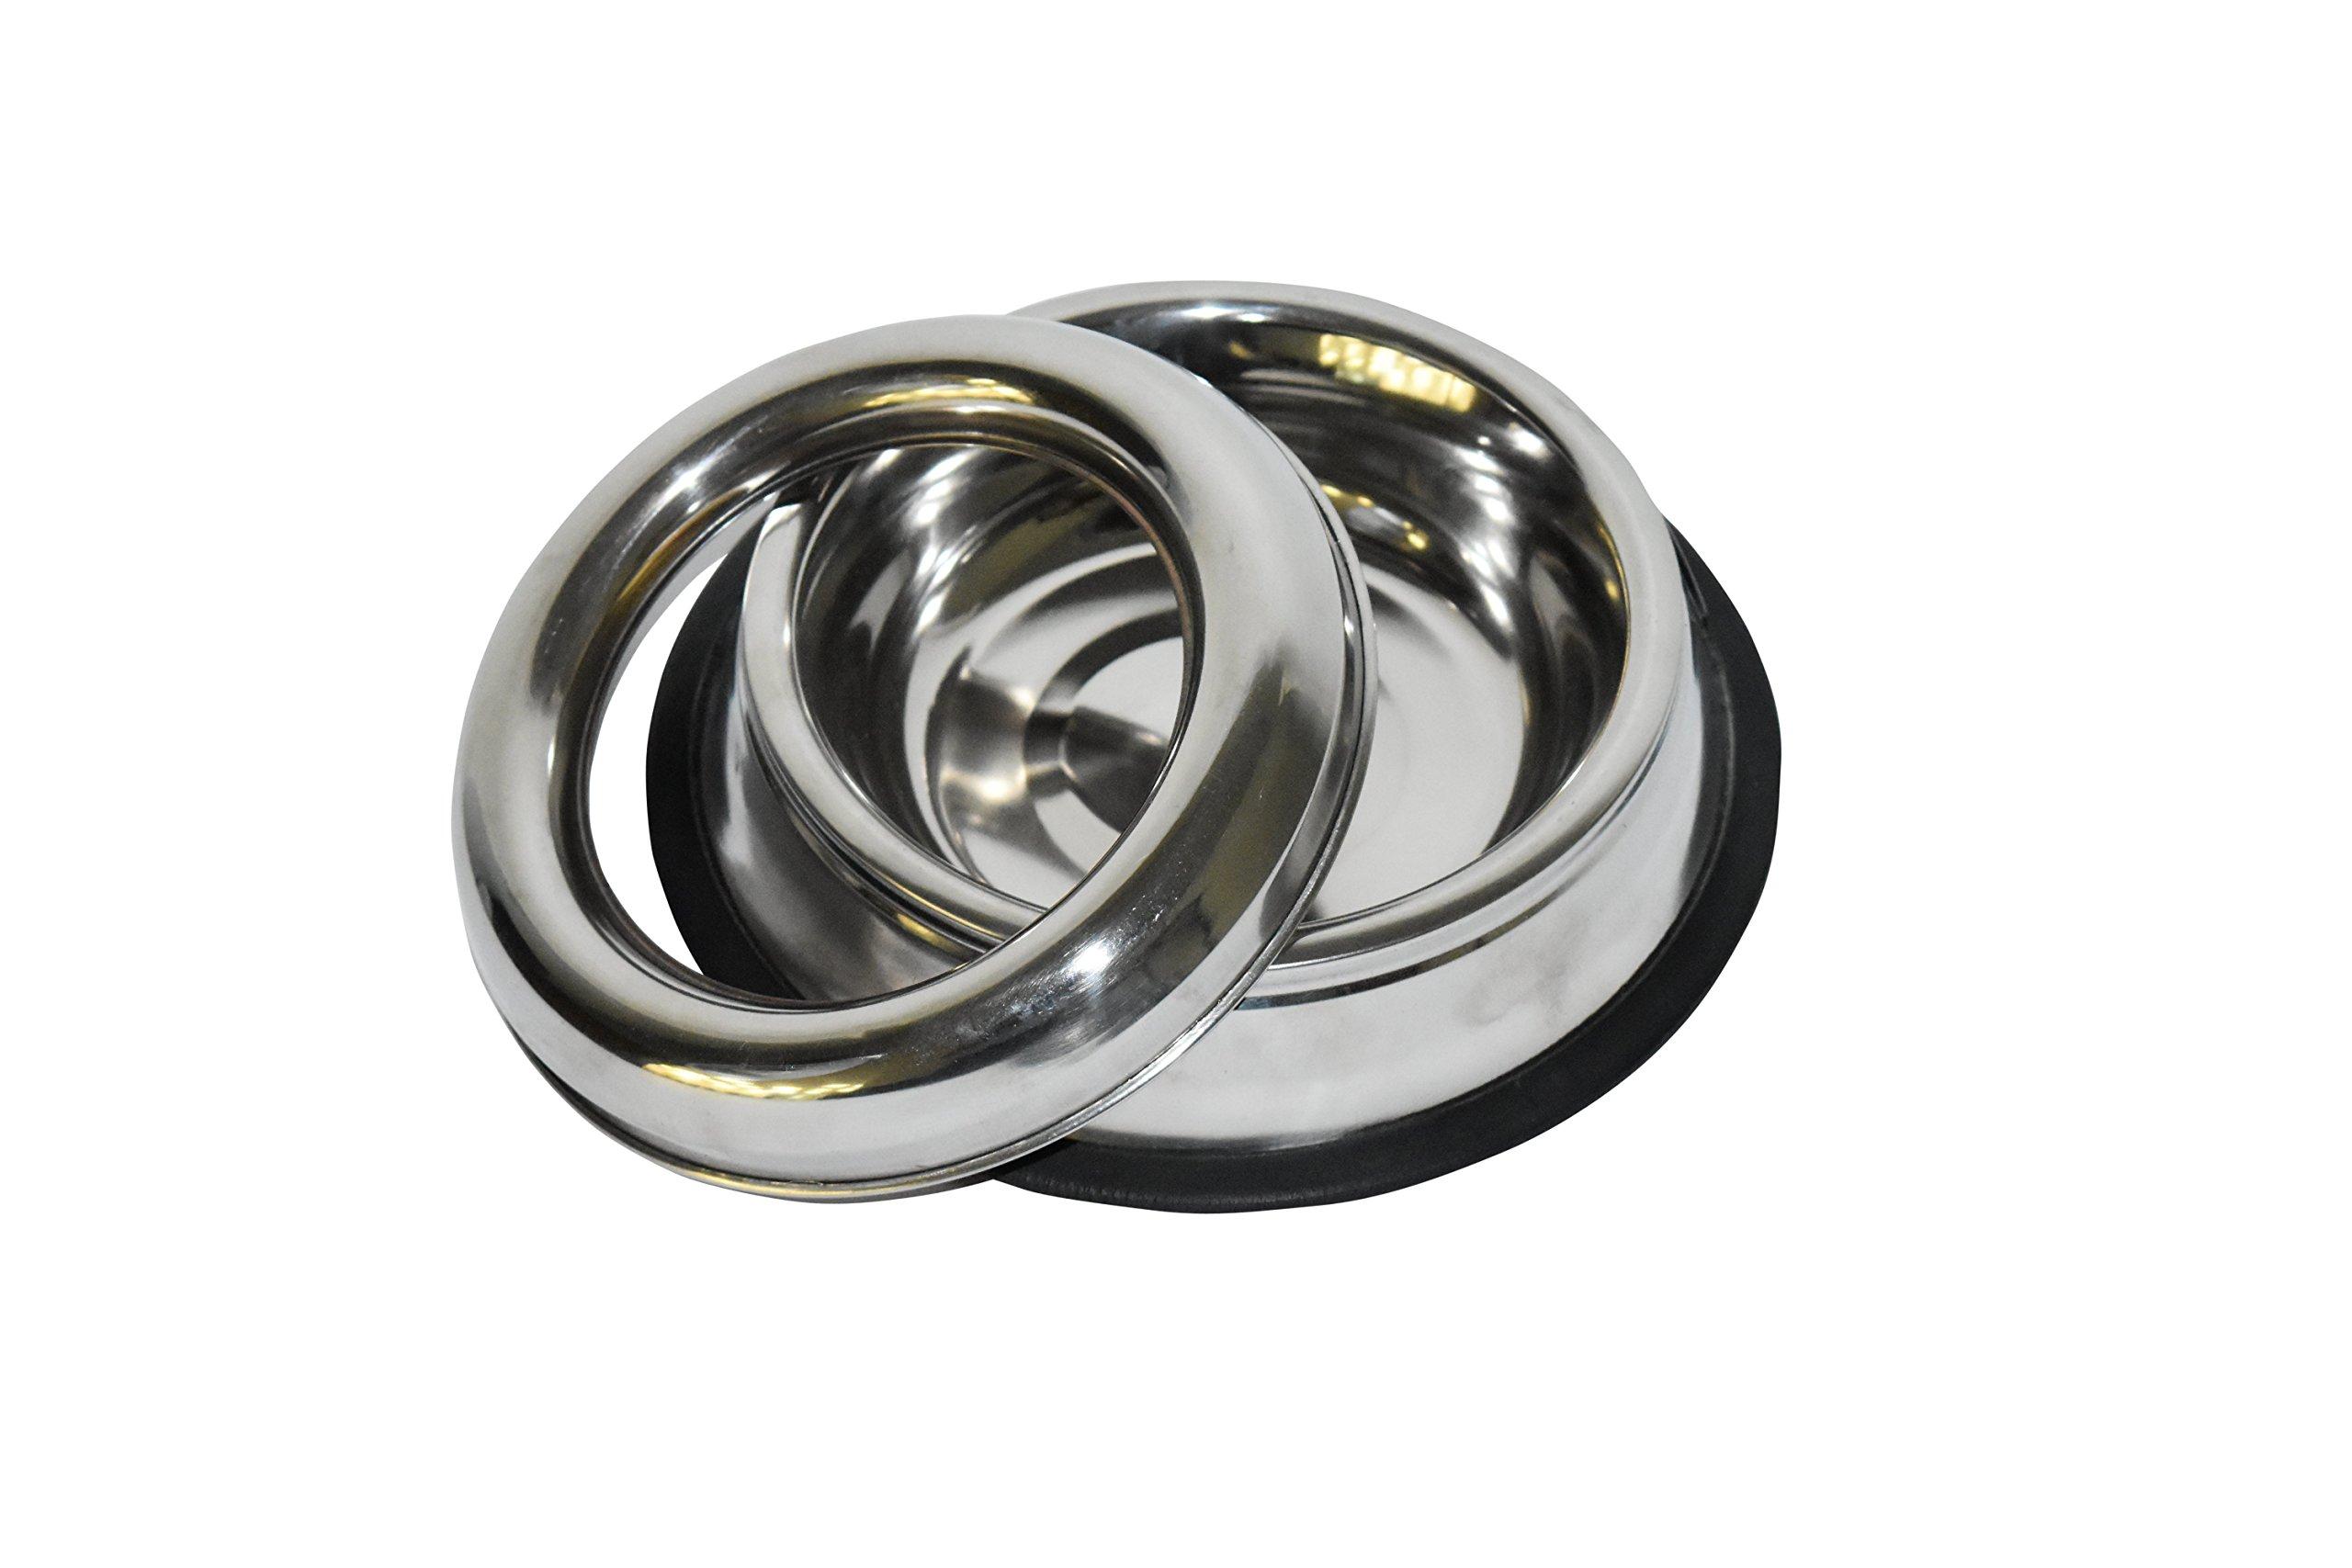 Stellar Bowls Splash Free Bowl with Removable Cover, 16 oz